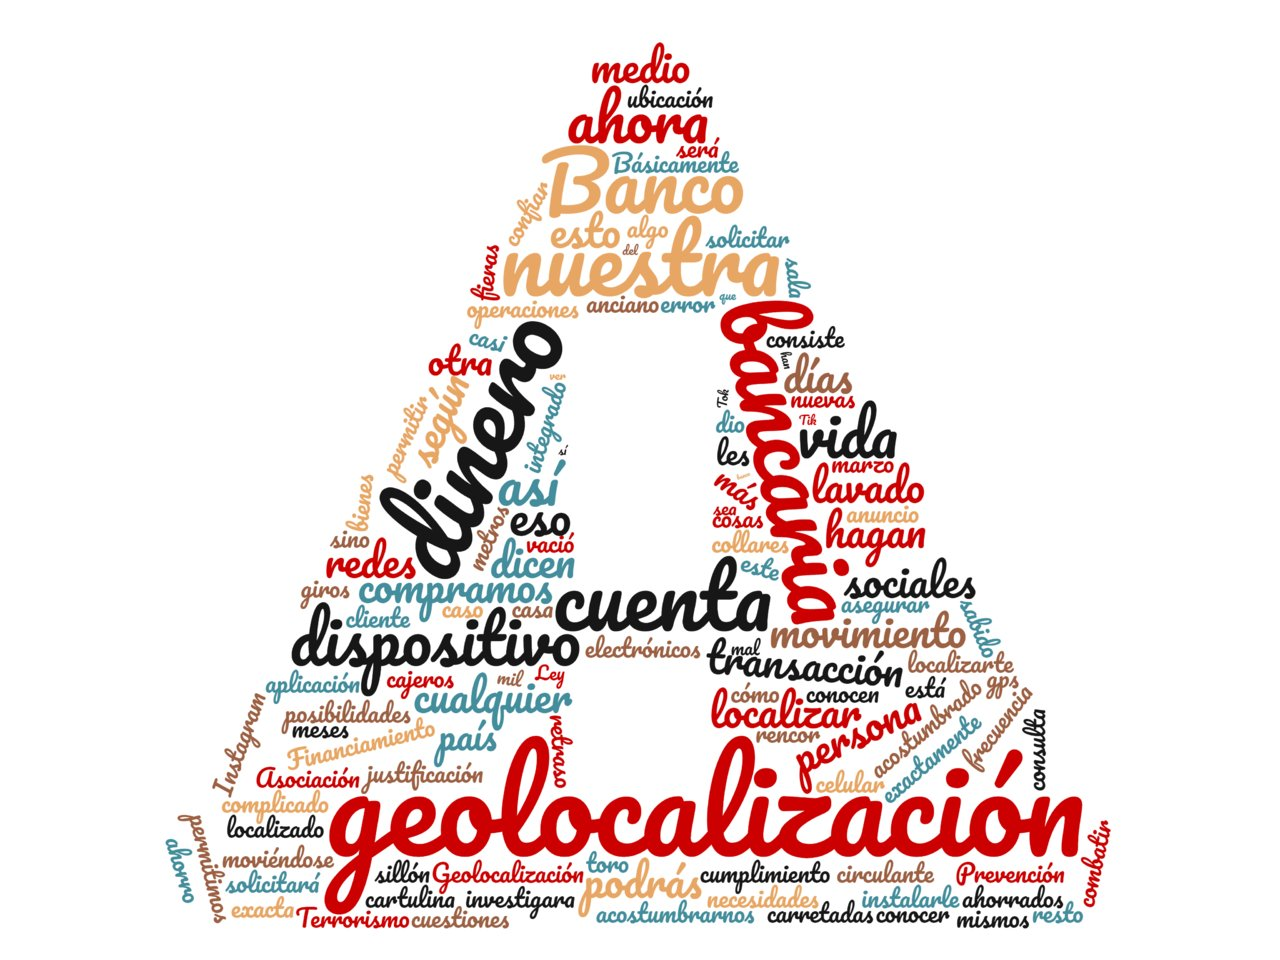 geolocalizacion-bancaria.jpg